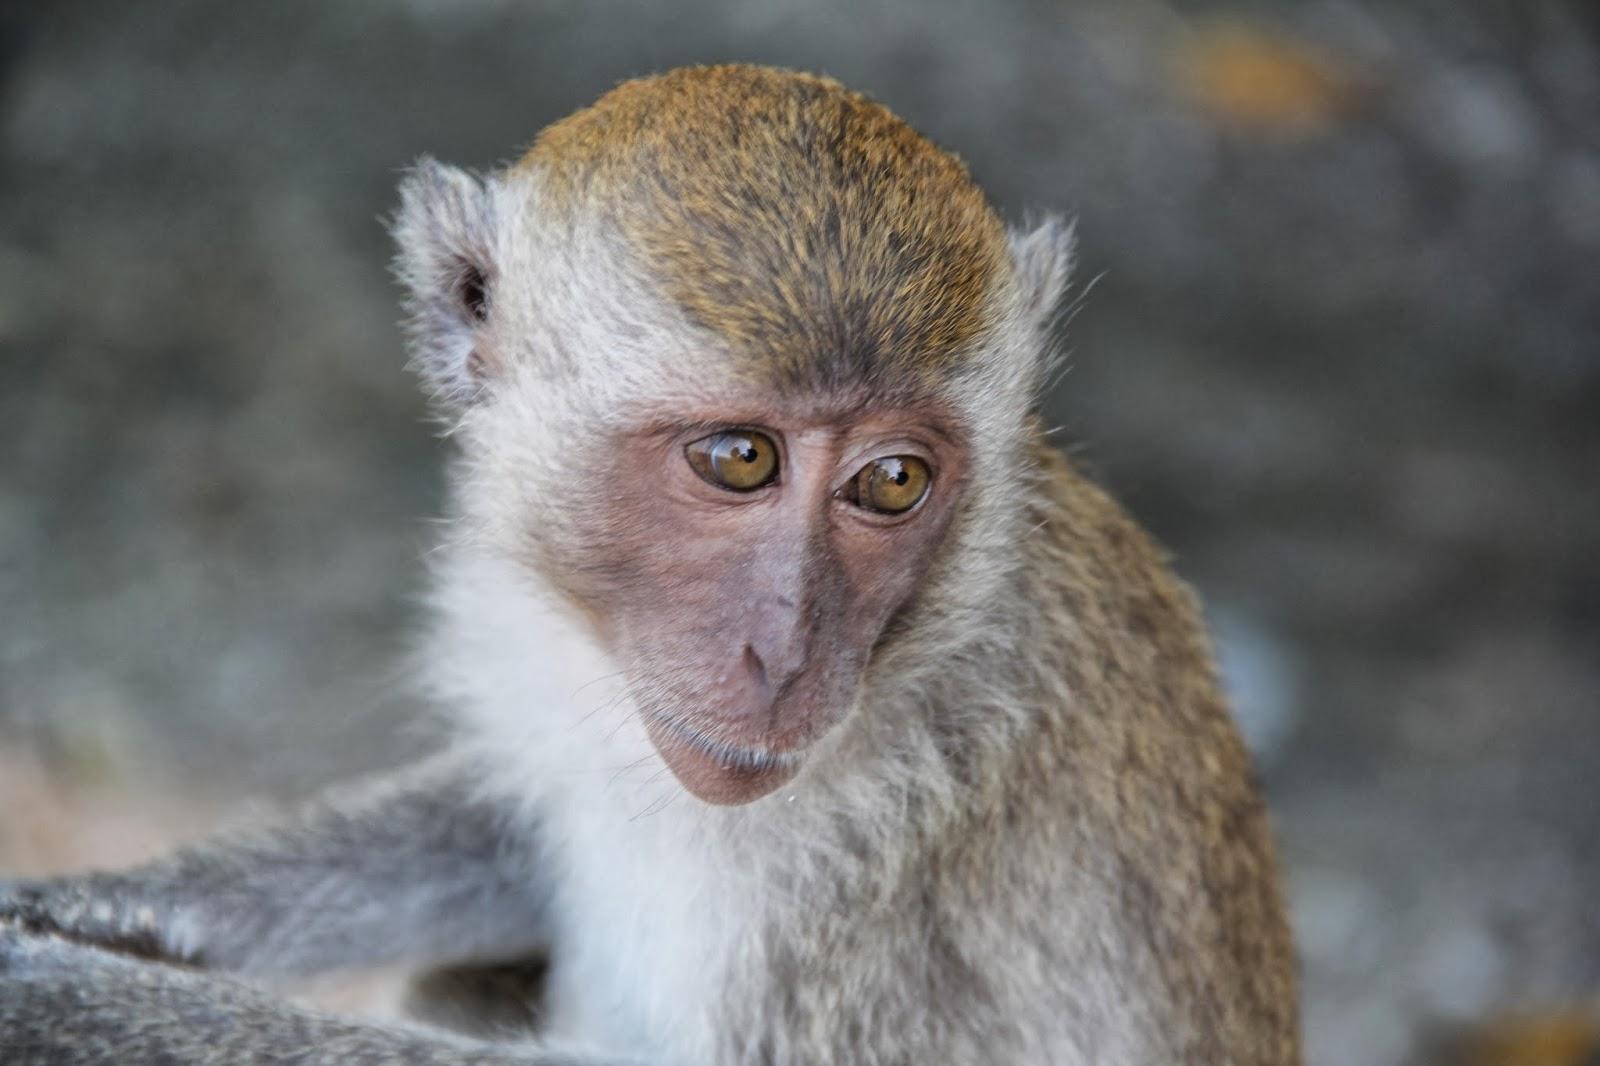 Nicobis Weltreise: Monkey Trail, Ao Nang, Krabi